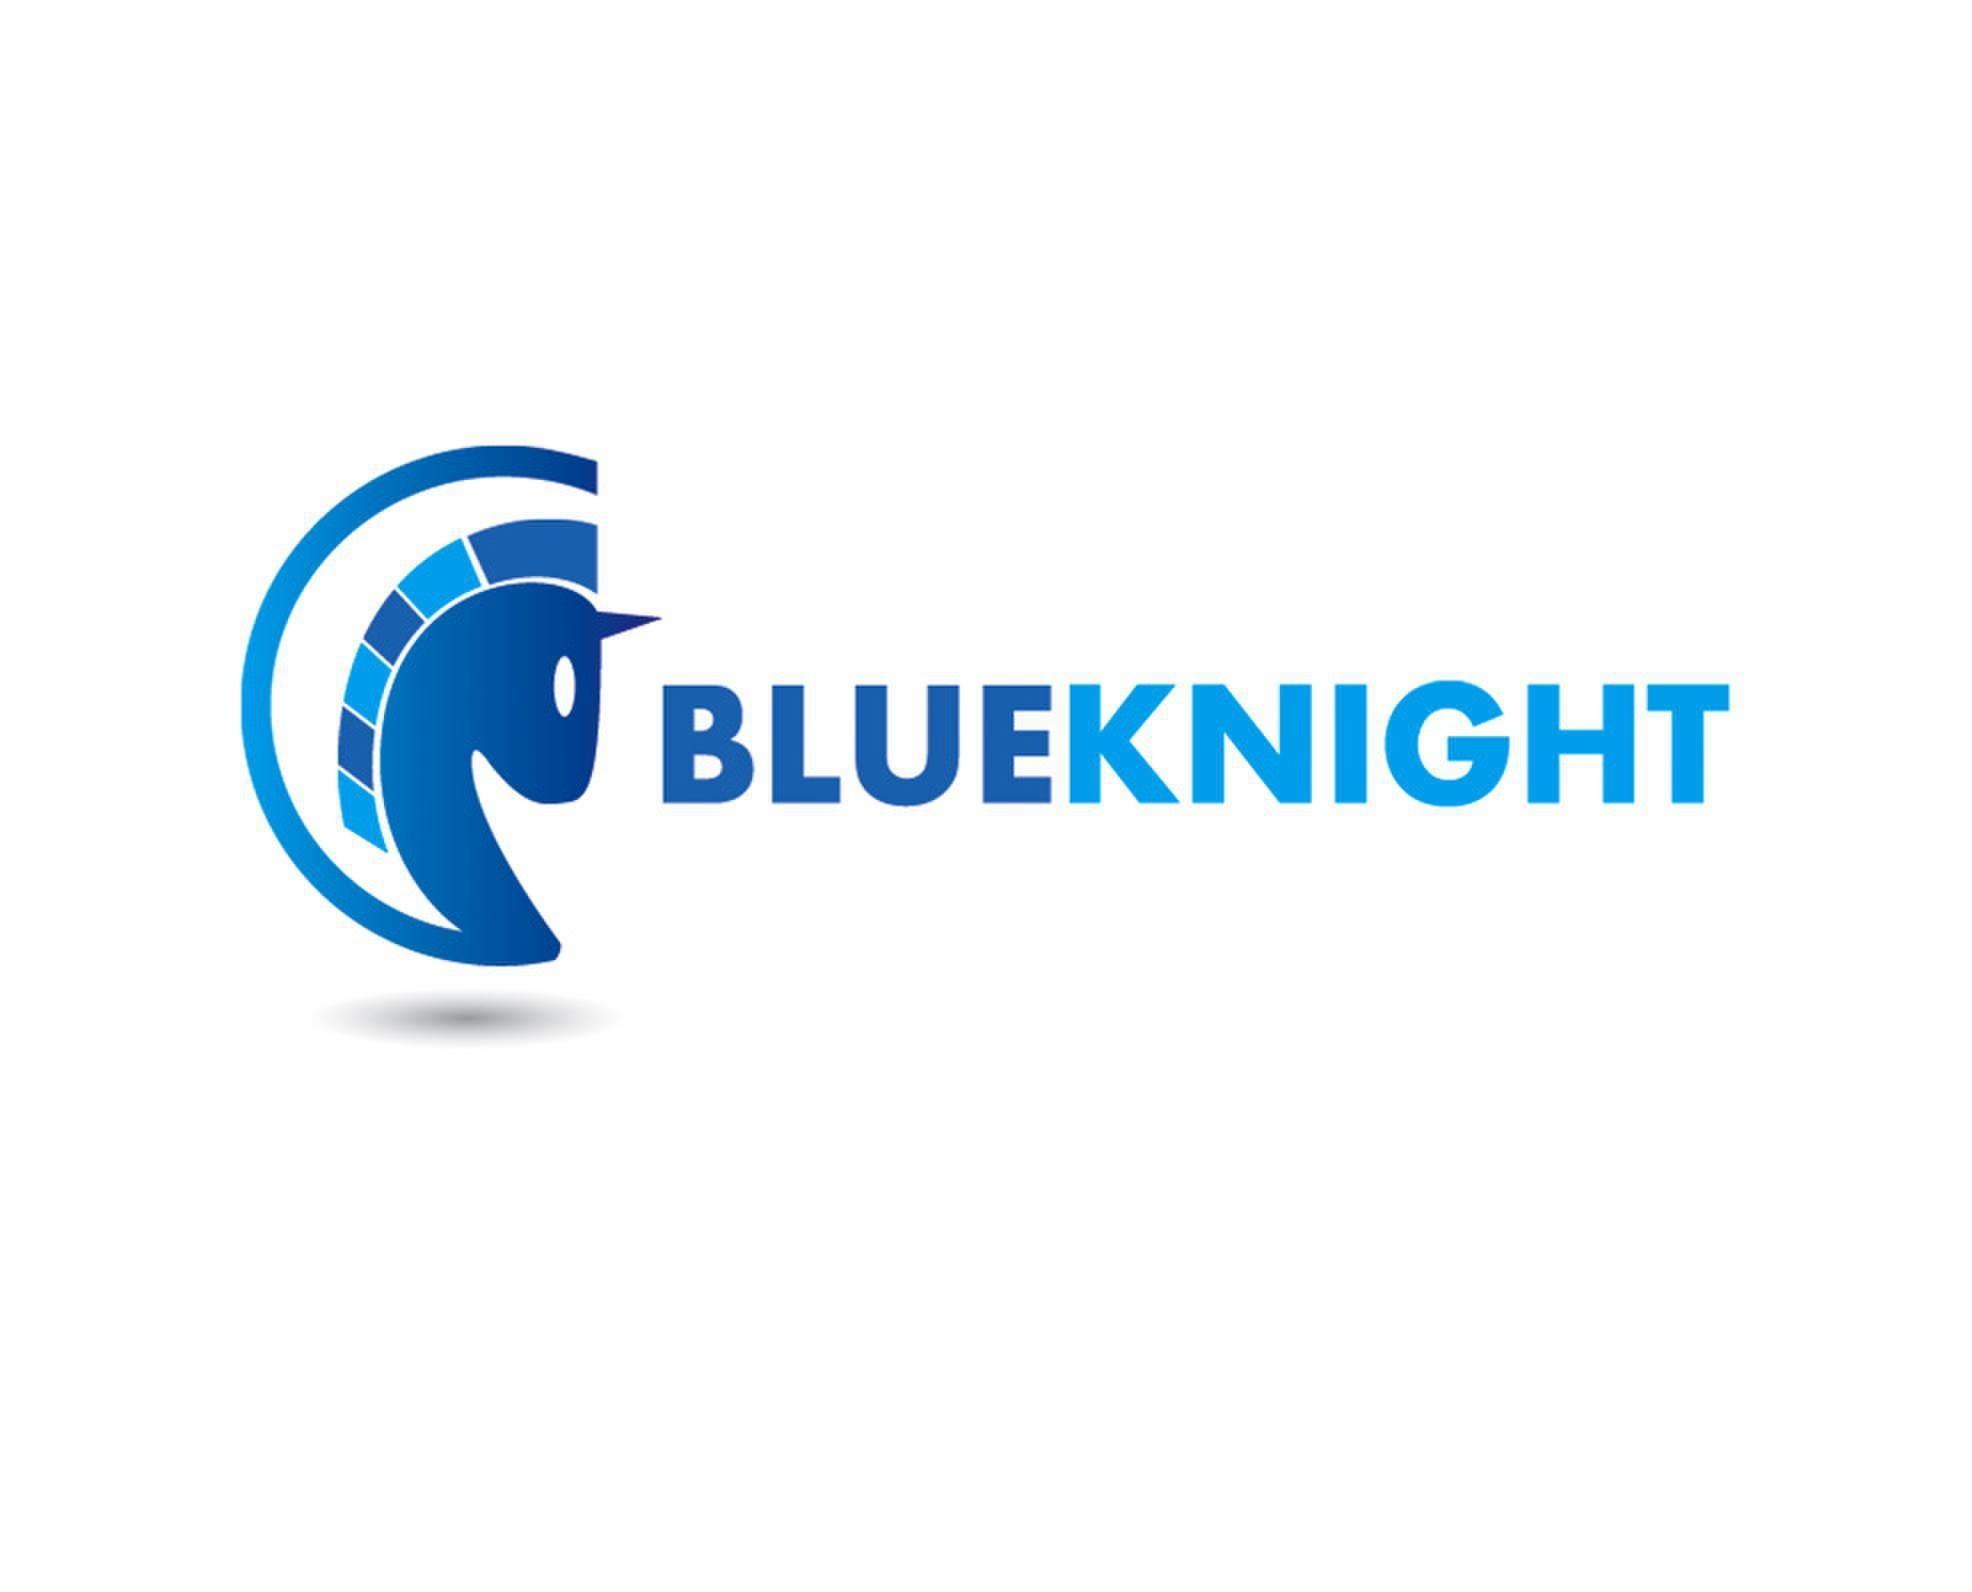 sample_logo_blueknight.jpg